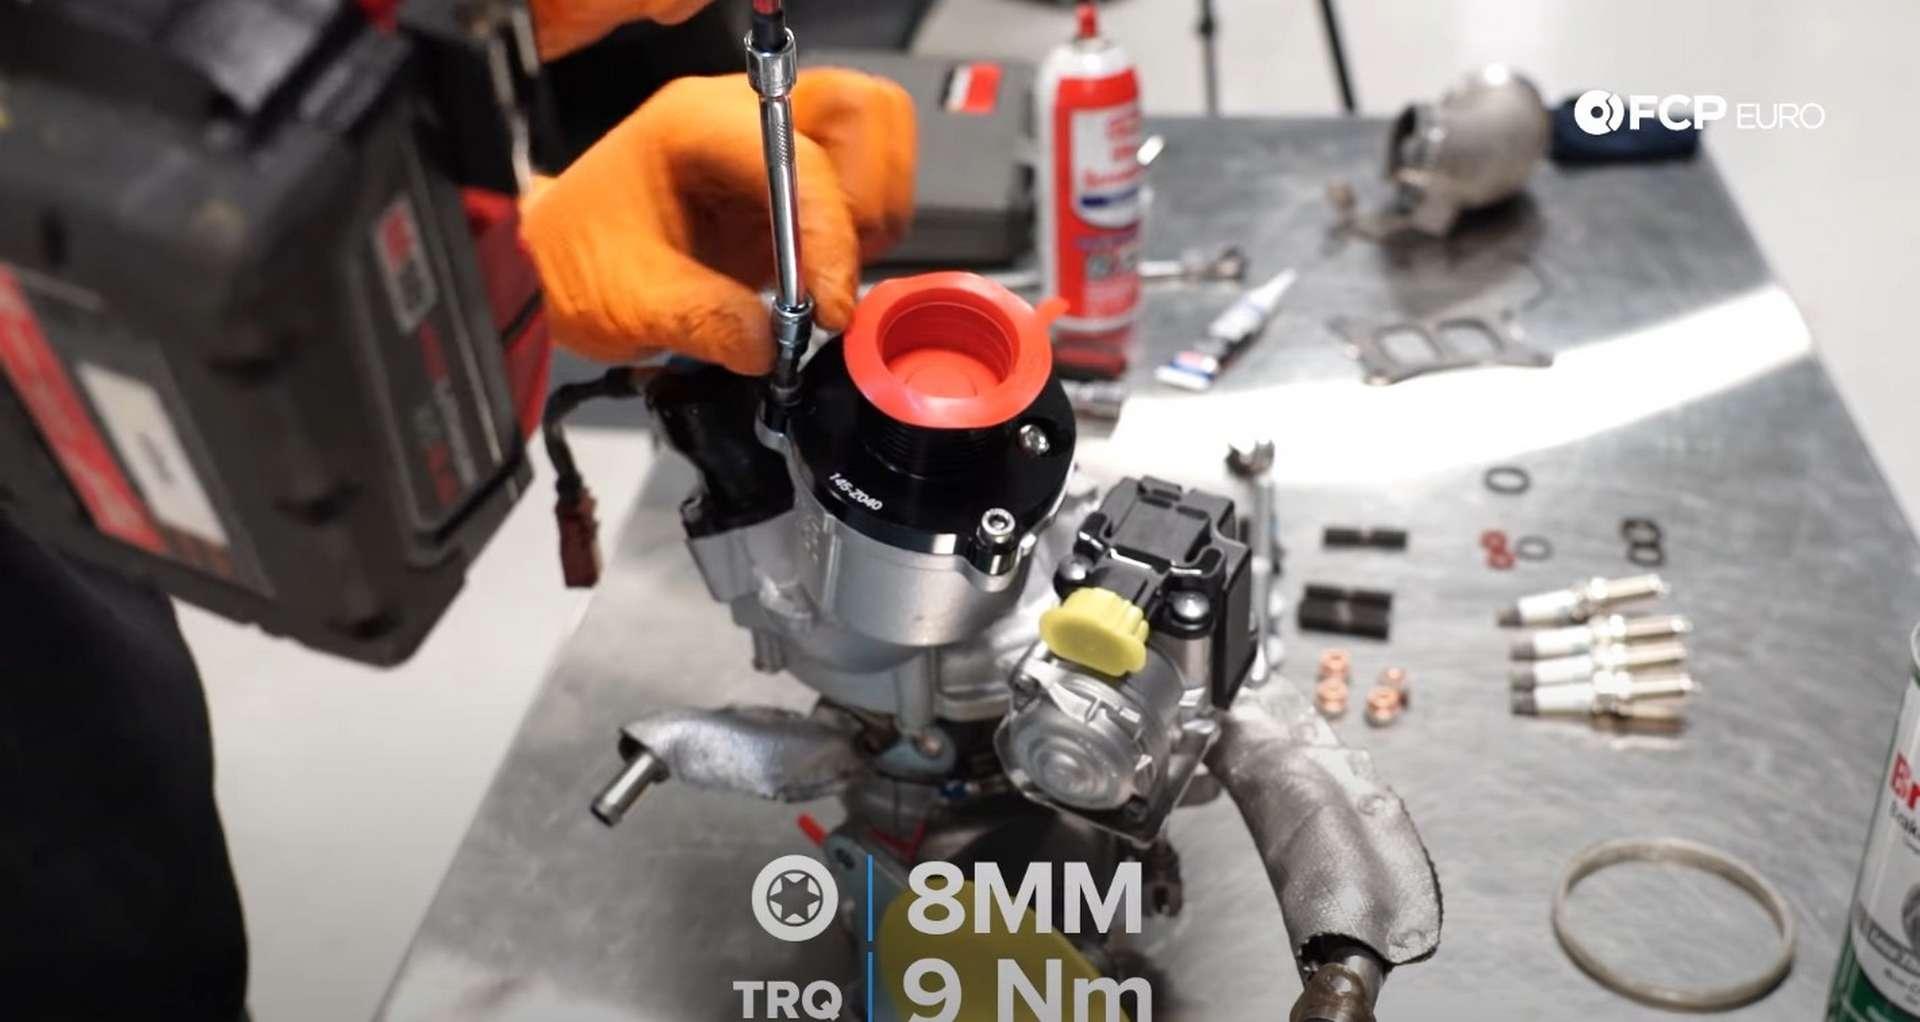 DIY MK7 VW GTI Turbocharger Upgrade tightening the turbo muffler bolts